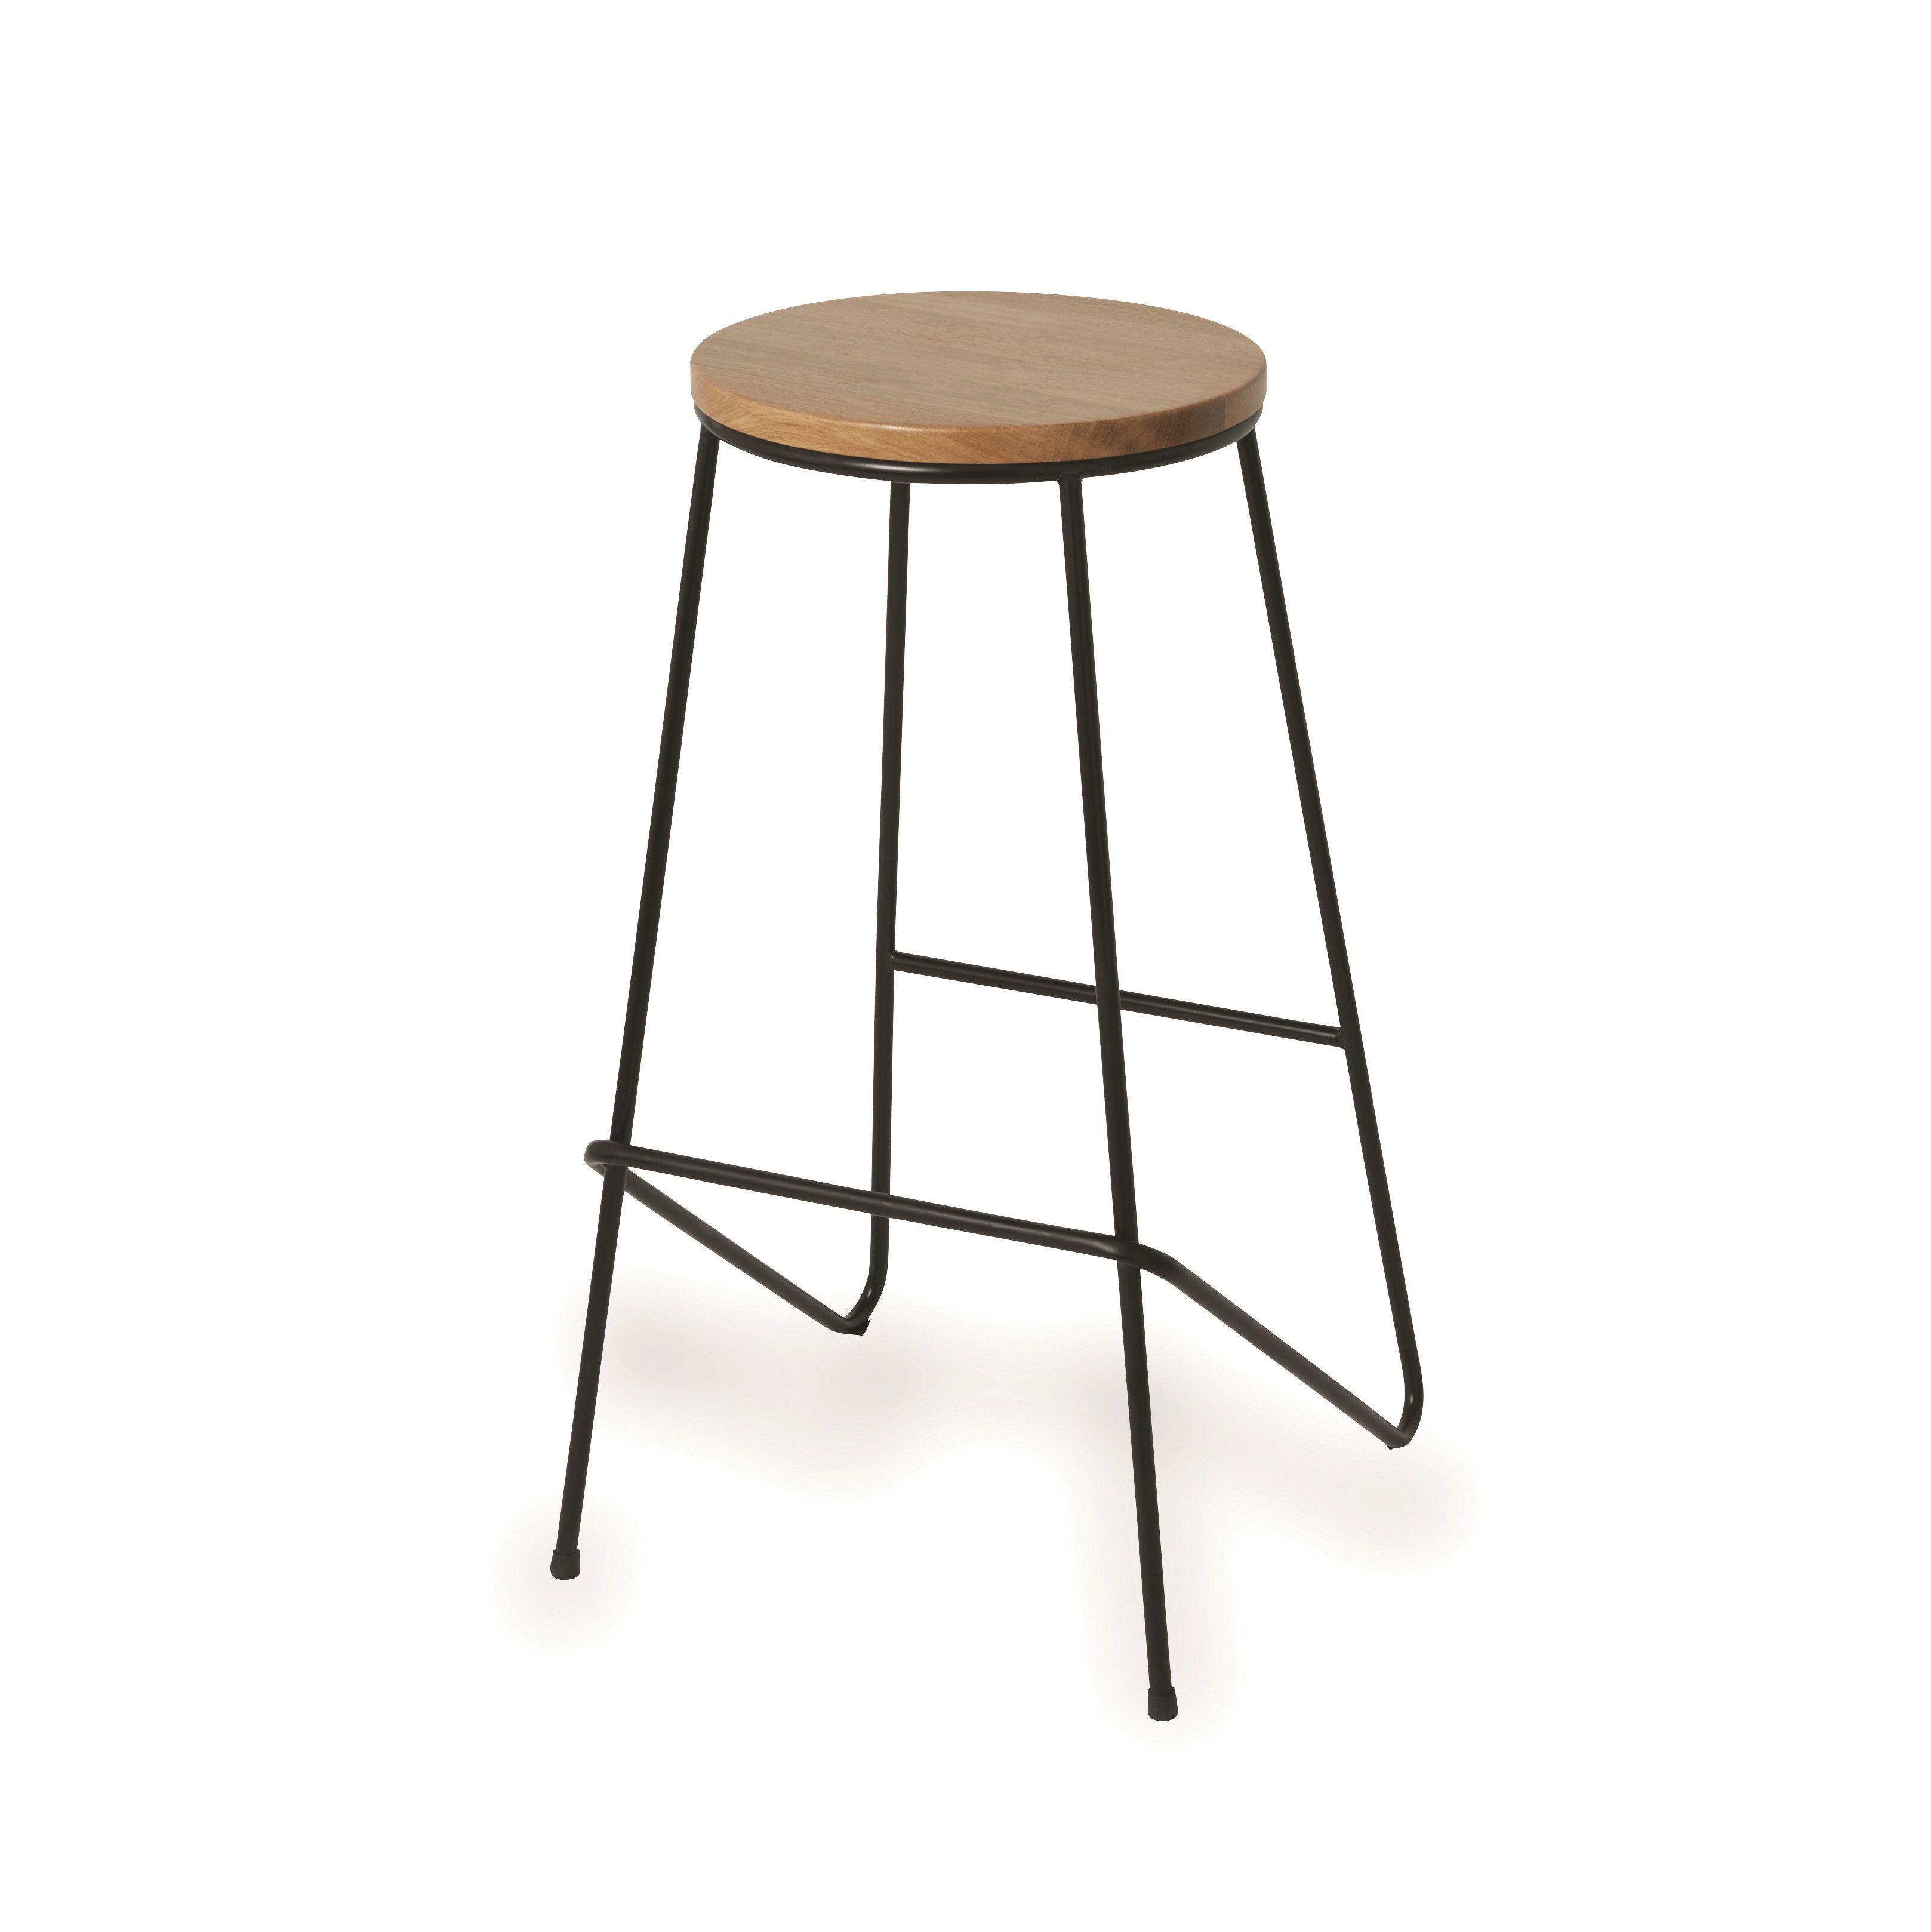 maloux black bar stool h 710mm w 400mm departments diy at b q